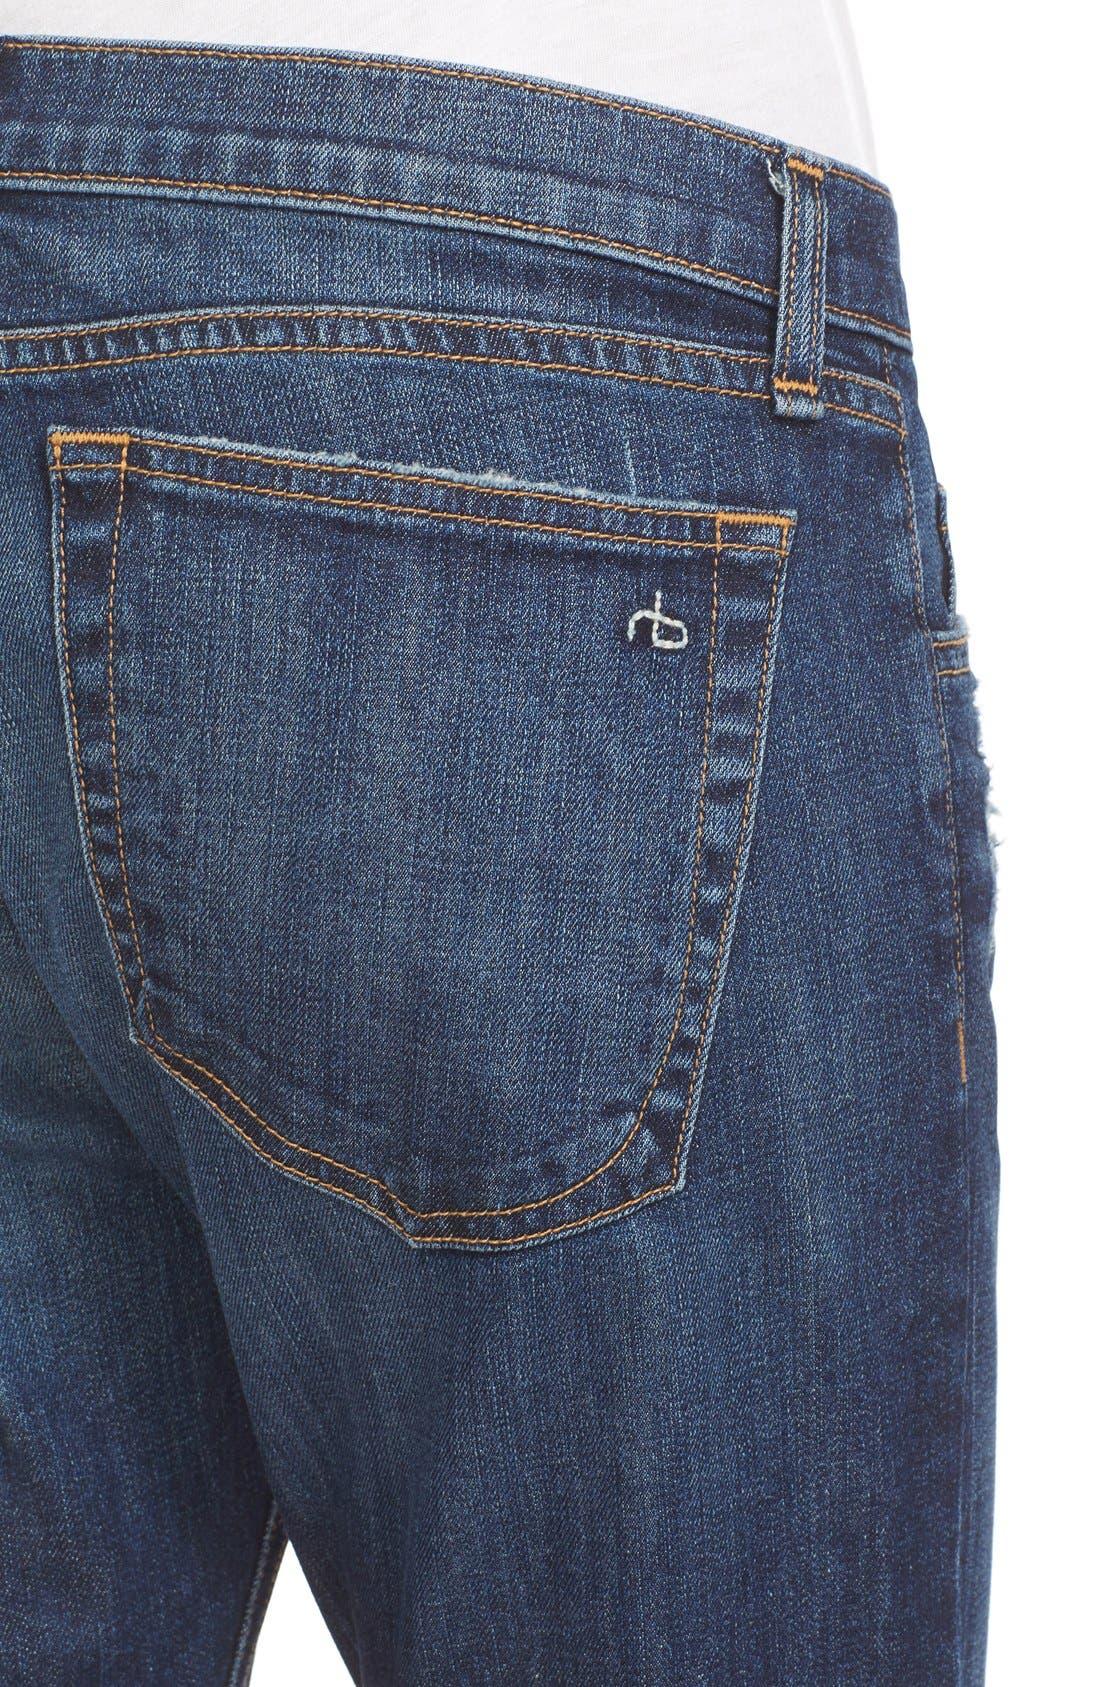 RAG & BONE, The Dre Slim Boyfriend Jeans, Alternate thumbnail 5, color, 423